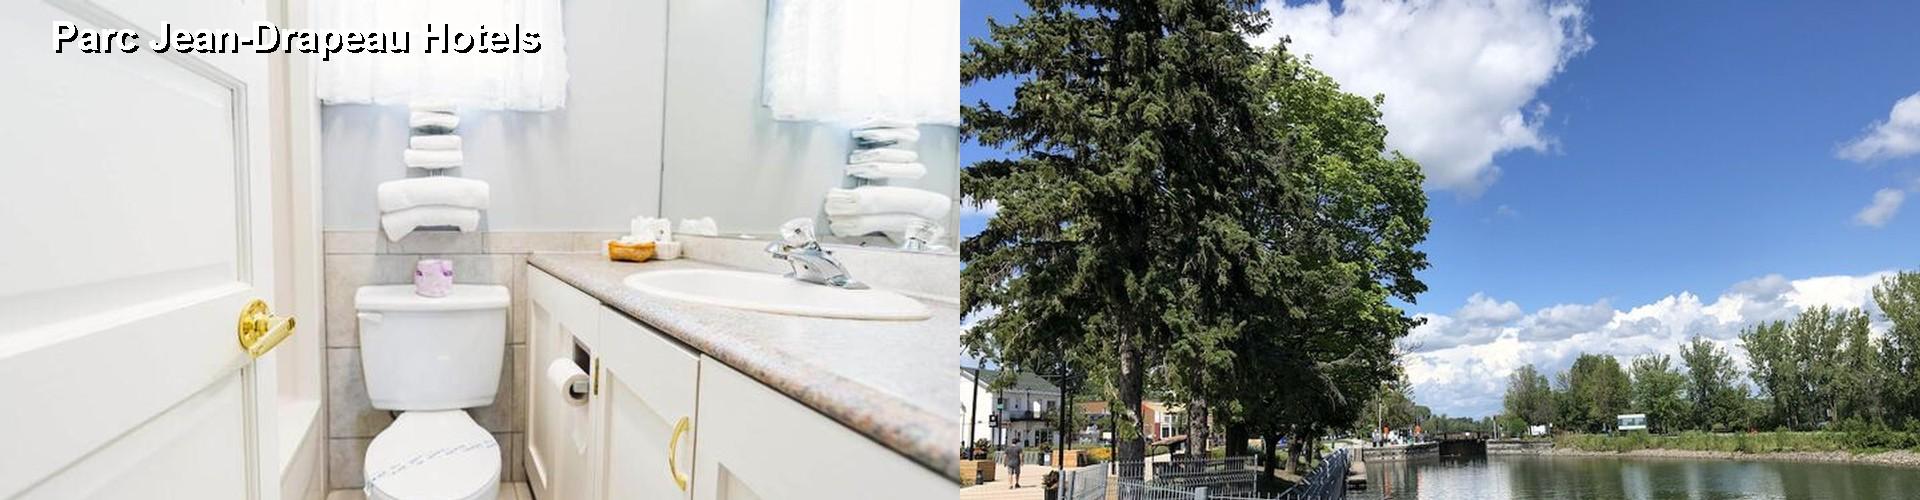 Hotels Near Parc Jean Drapeau Montreal Qc